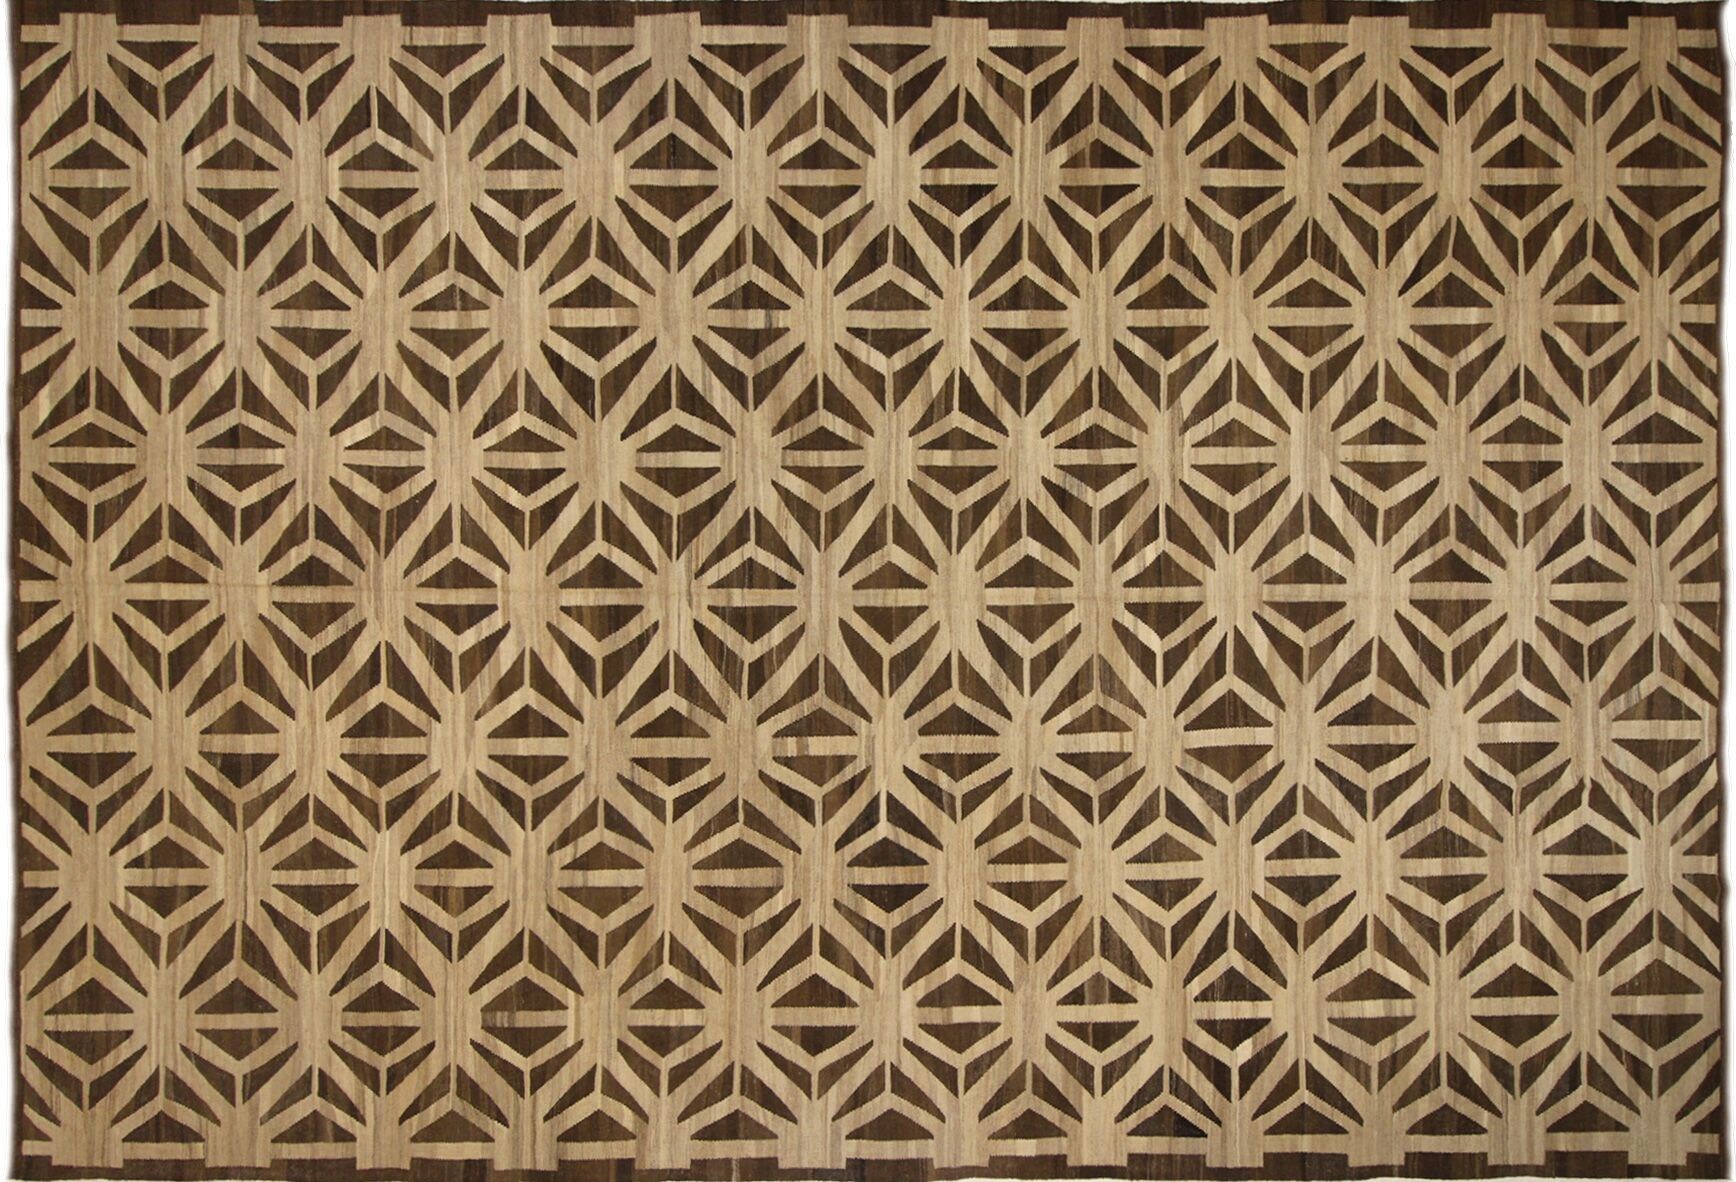 Remmington Kilim Handwoven Flatweave Wool Beige Area Rug